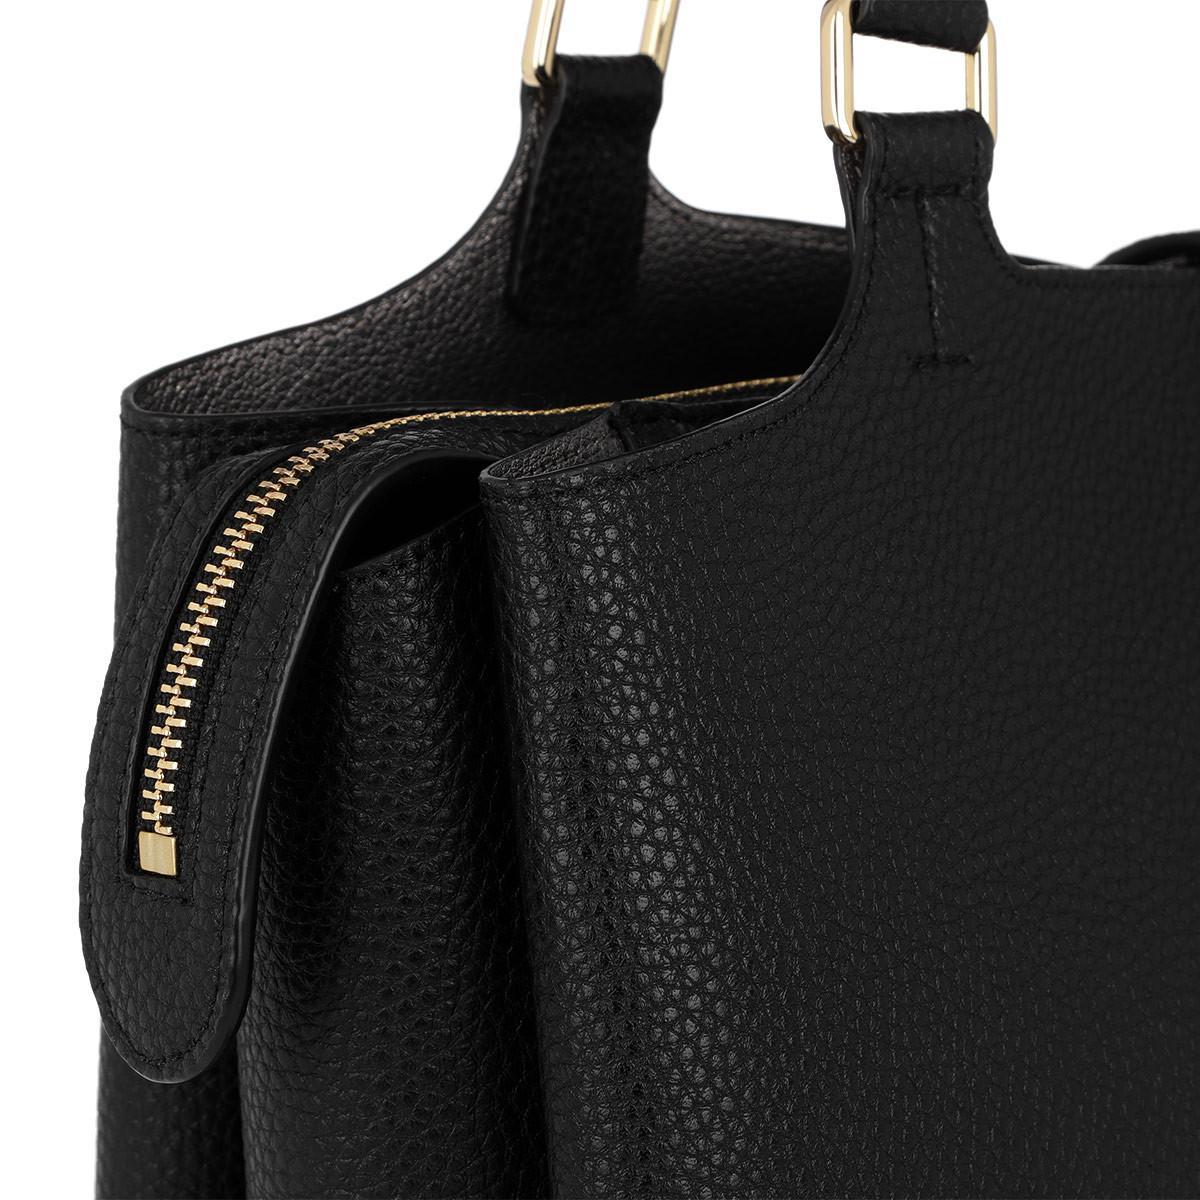 DKNY Leather Paris Large Tote Black